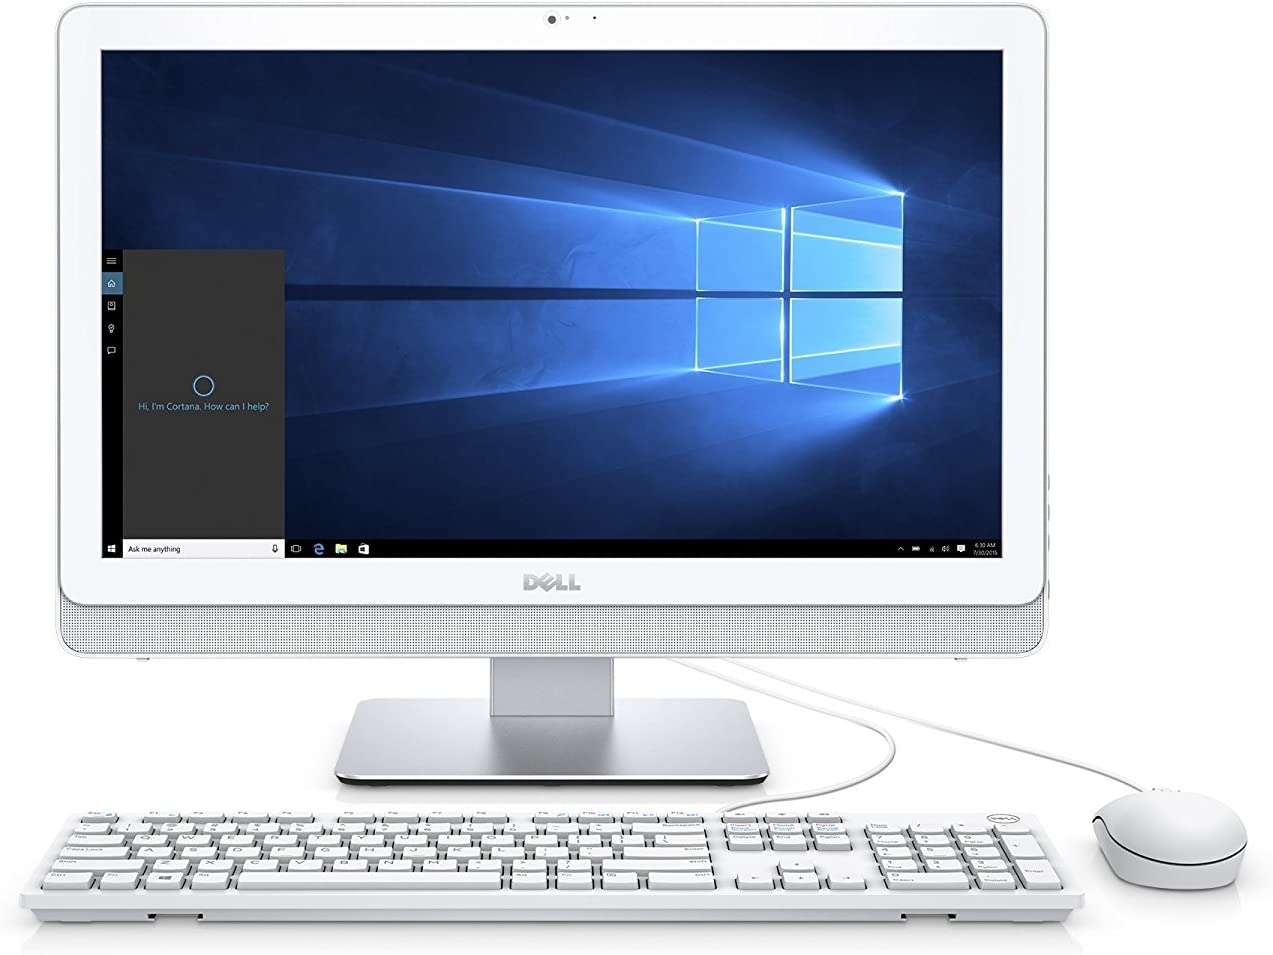 Dell Inspiron 3265 21.5in FHD All-in-One Desktop PC - AMD E2-7110 1.8GHz, 4GB, 1TB HDD, DVDRW, Bluetooth, Windows 10 Home - White (Renewed)